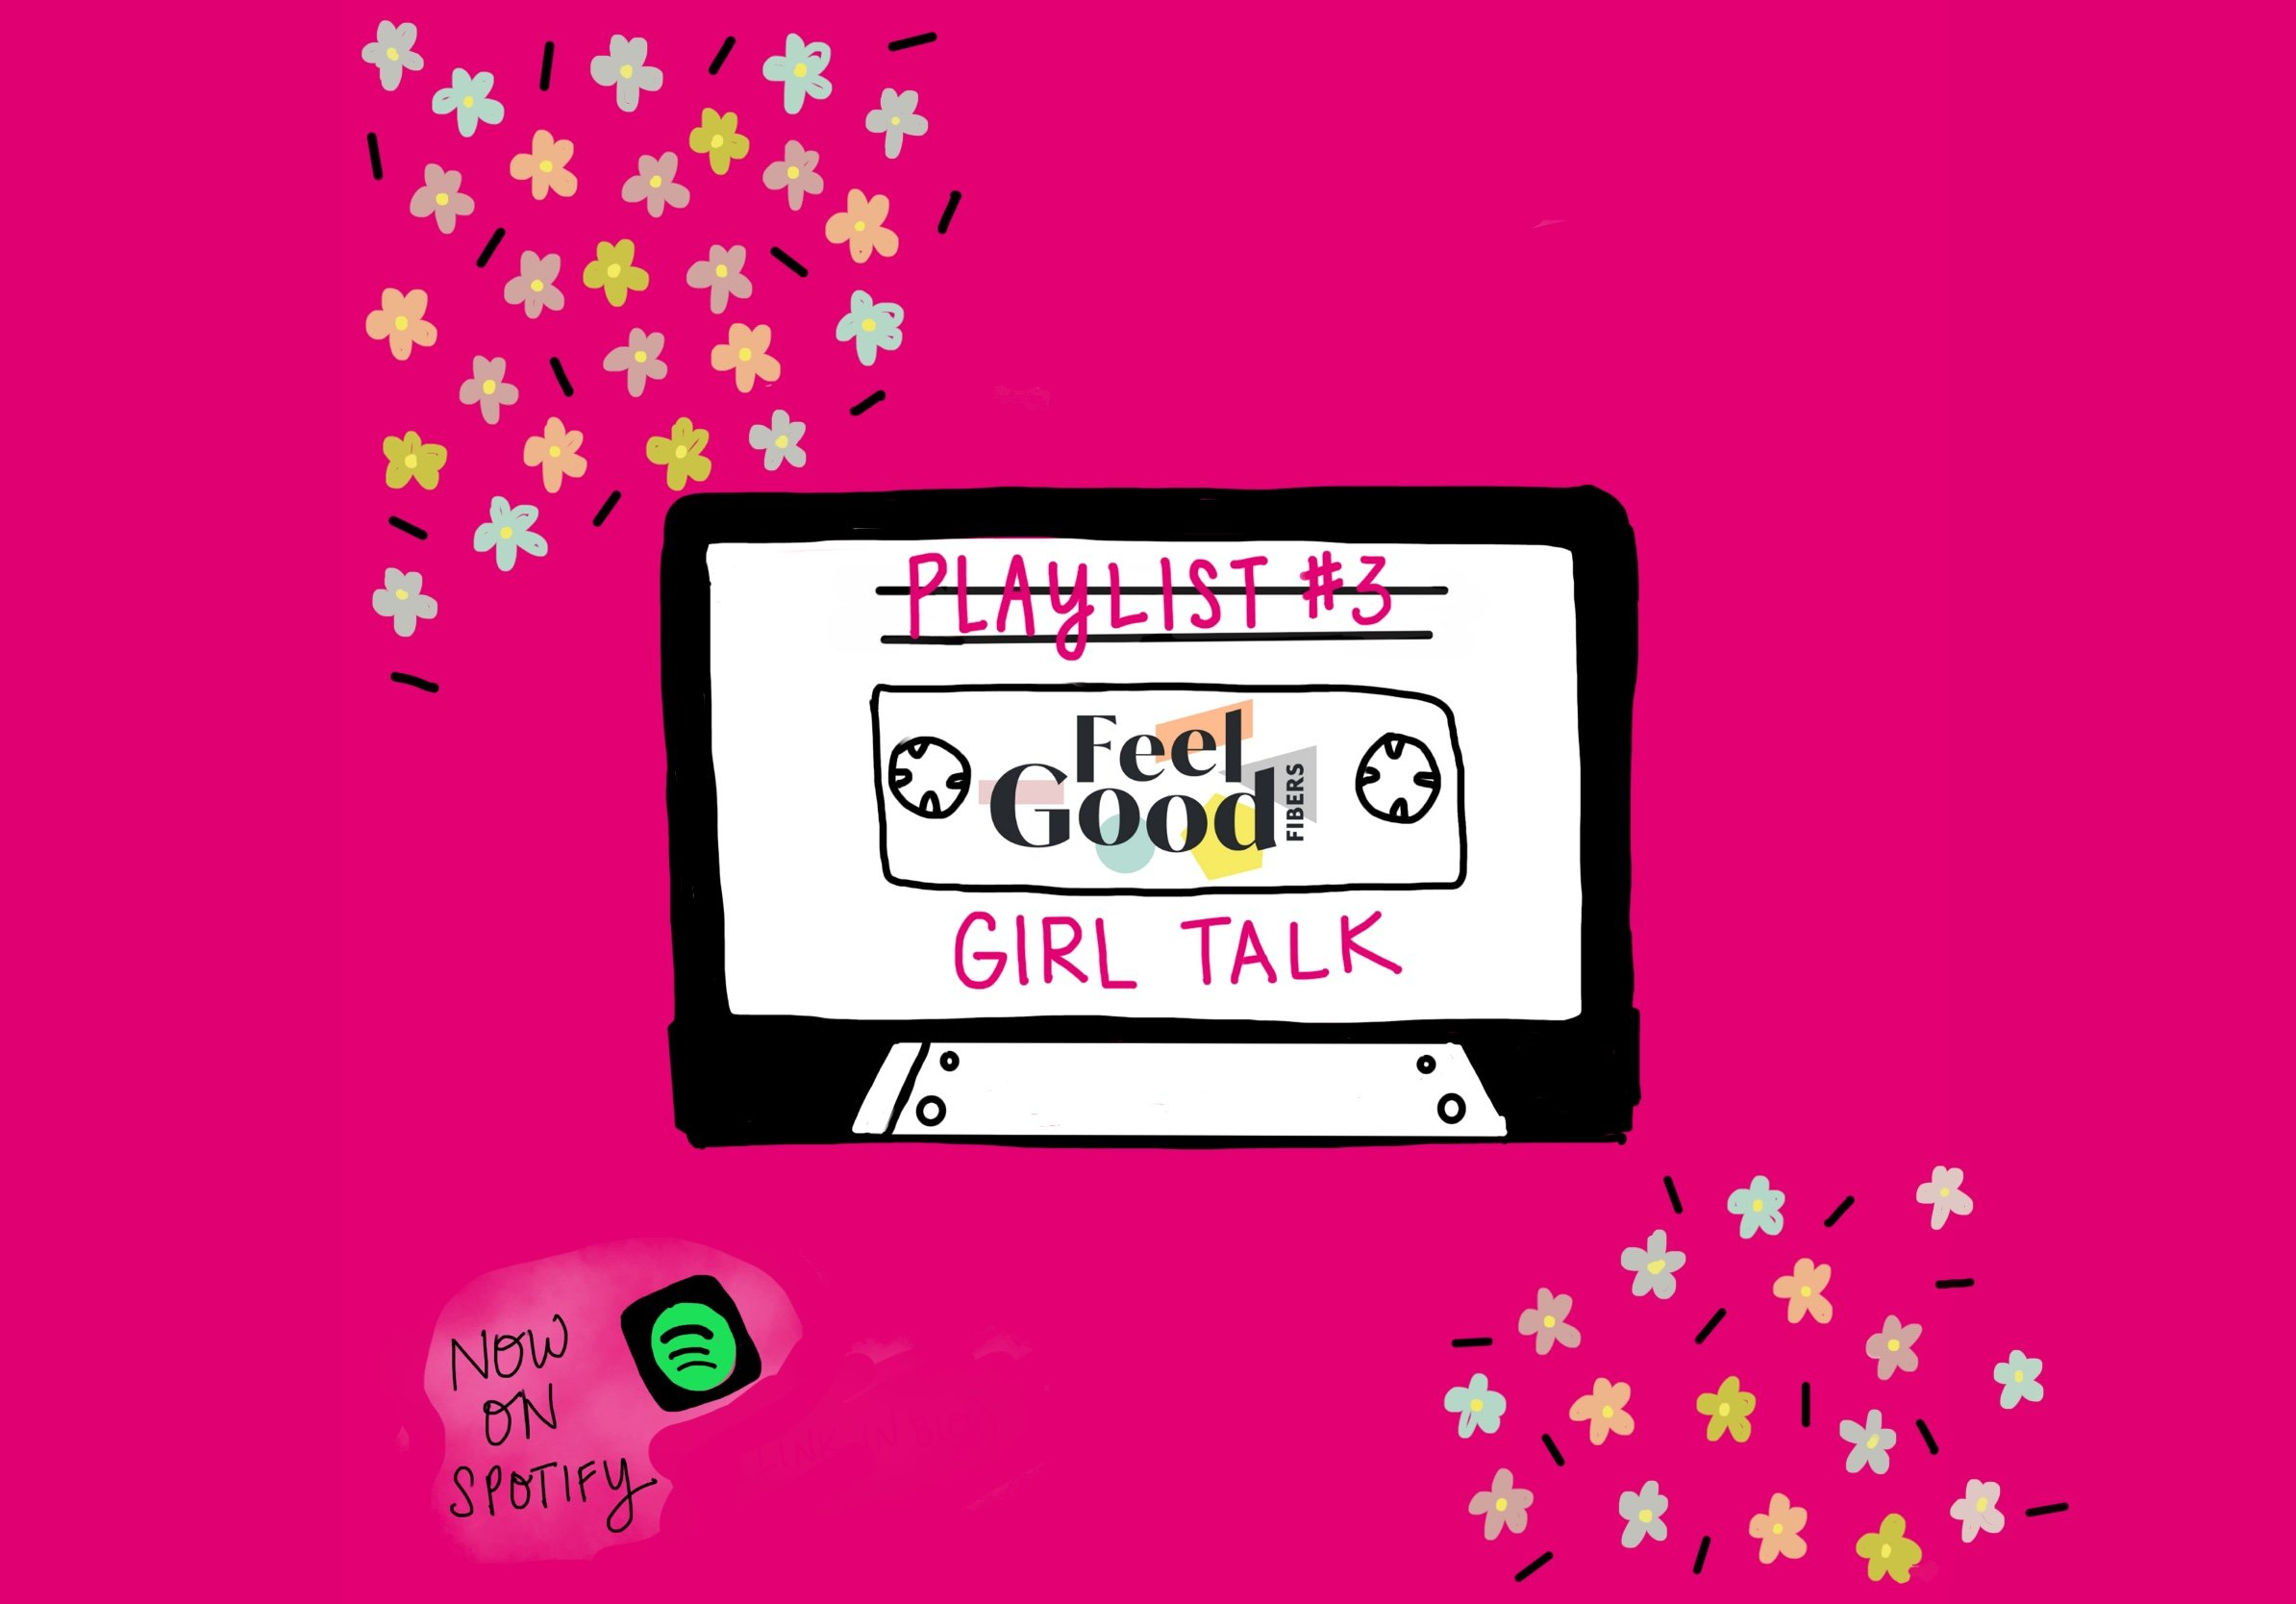 FeelGood Fibers Playlist #3 Girl Talk on Spotify